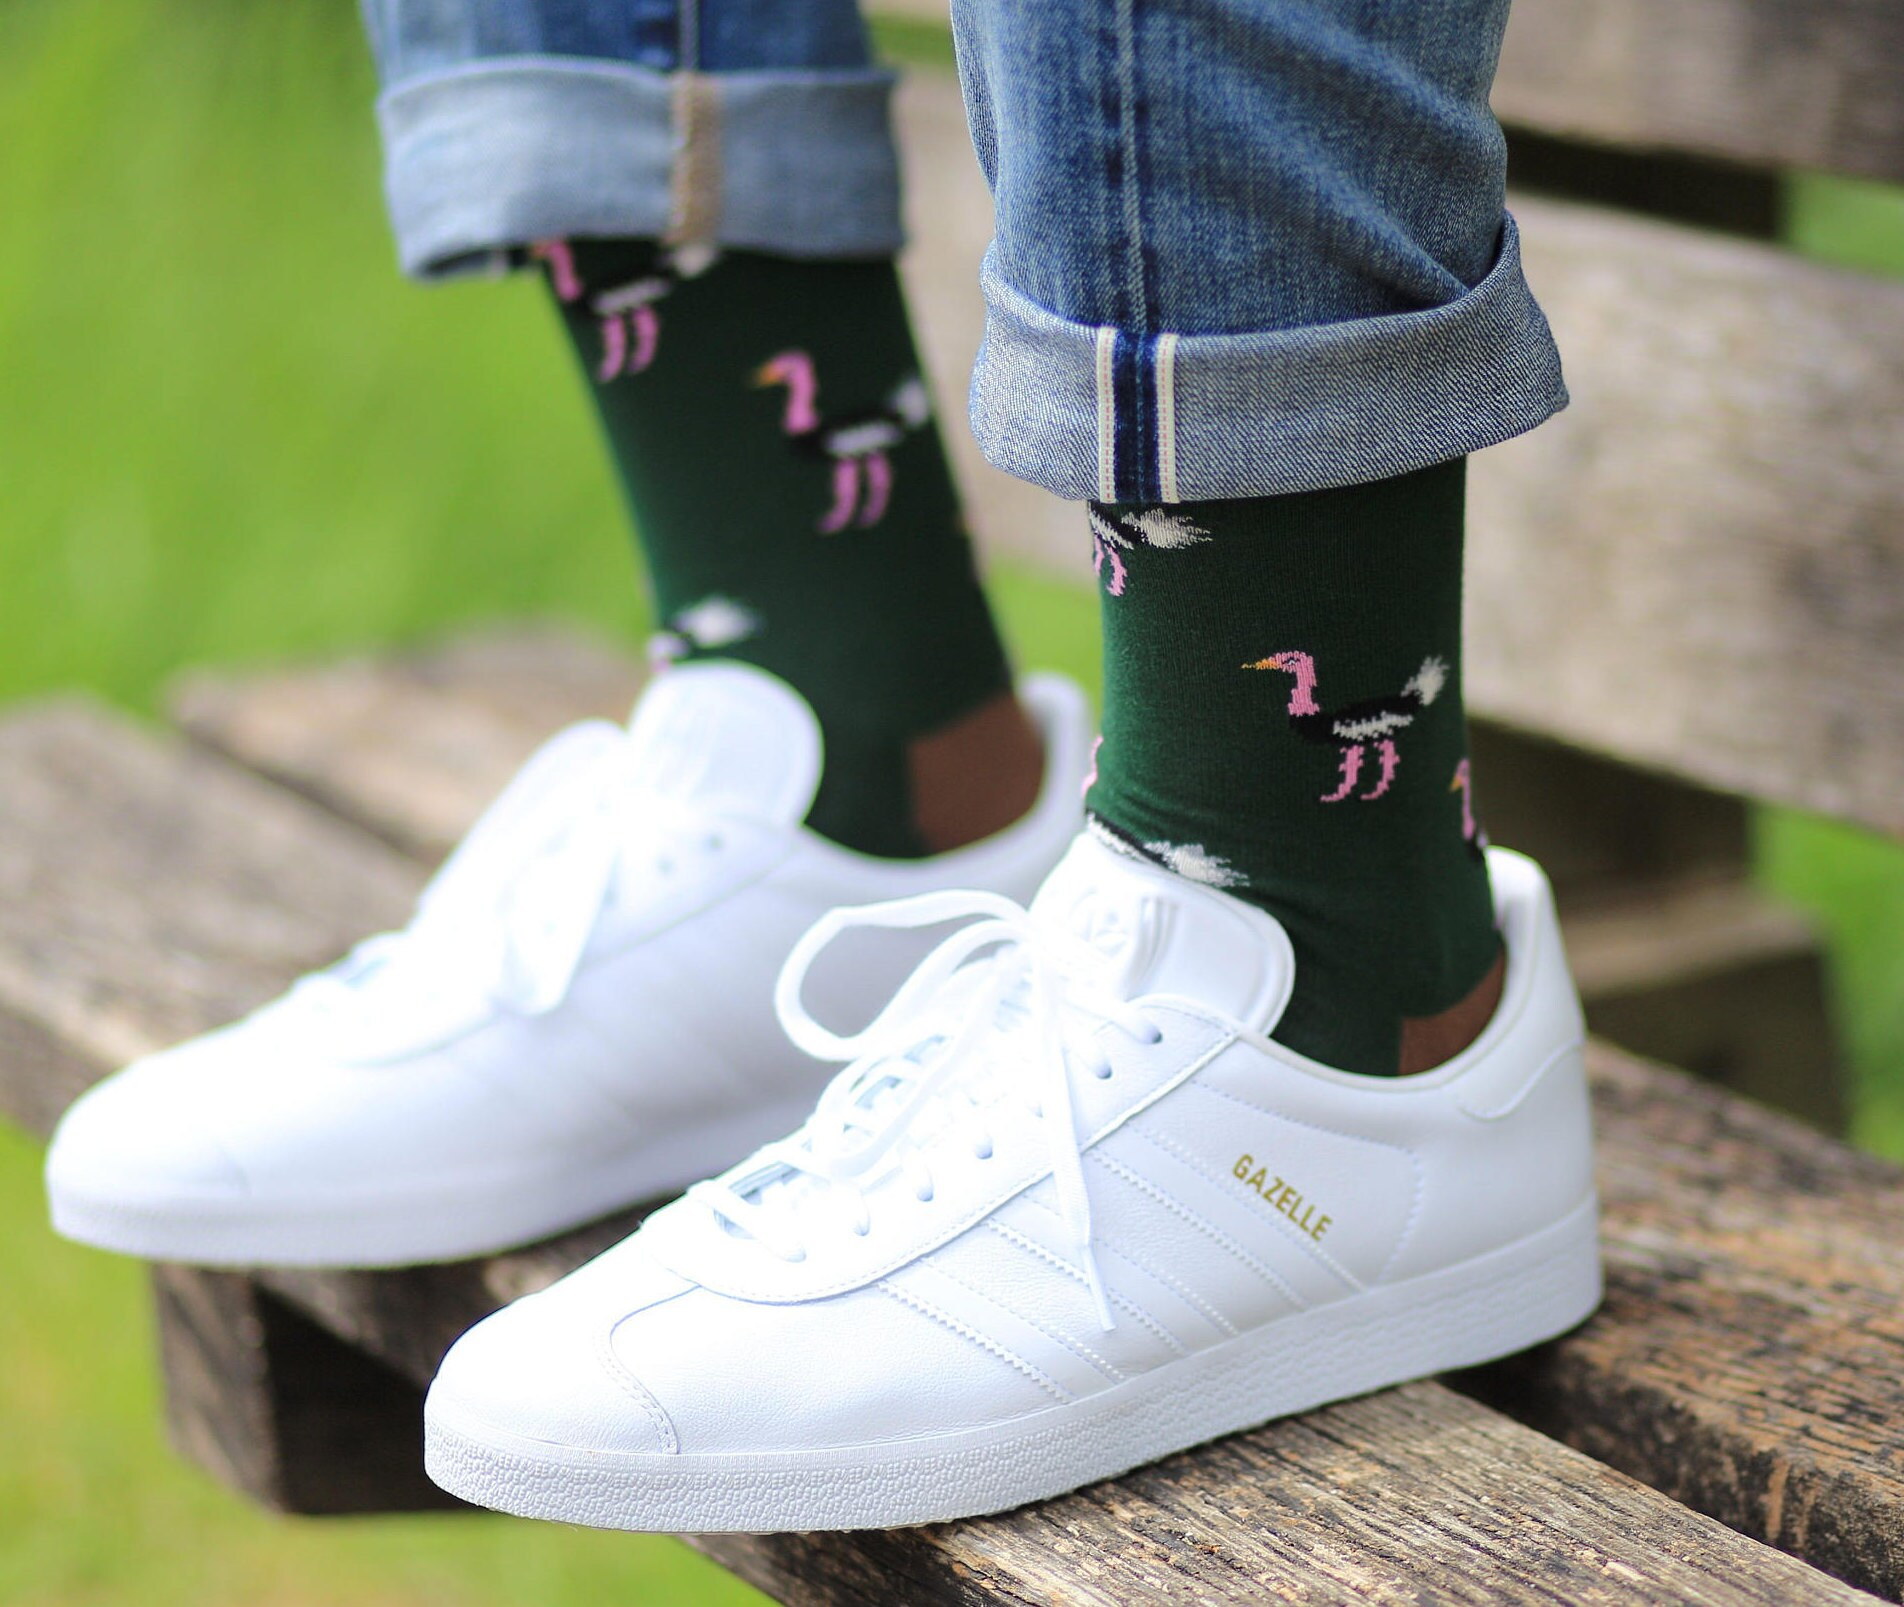 Ostrich socks  Fathers day gift  animal socks  green socks  cool socks  colourful socks  men socks  Gift socks   Vintage socks